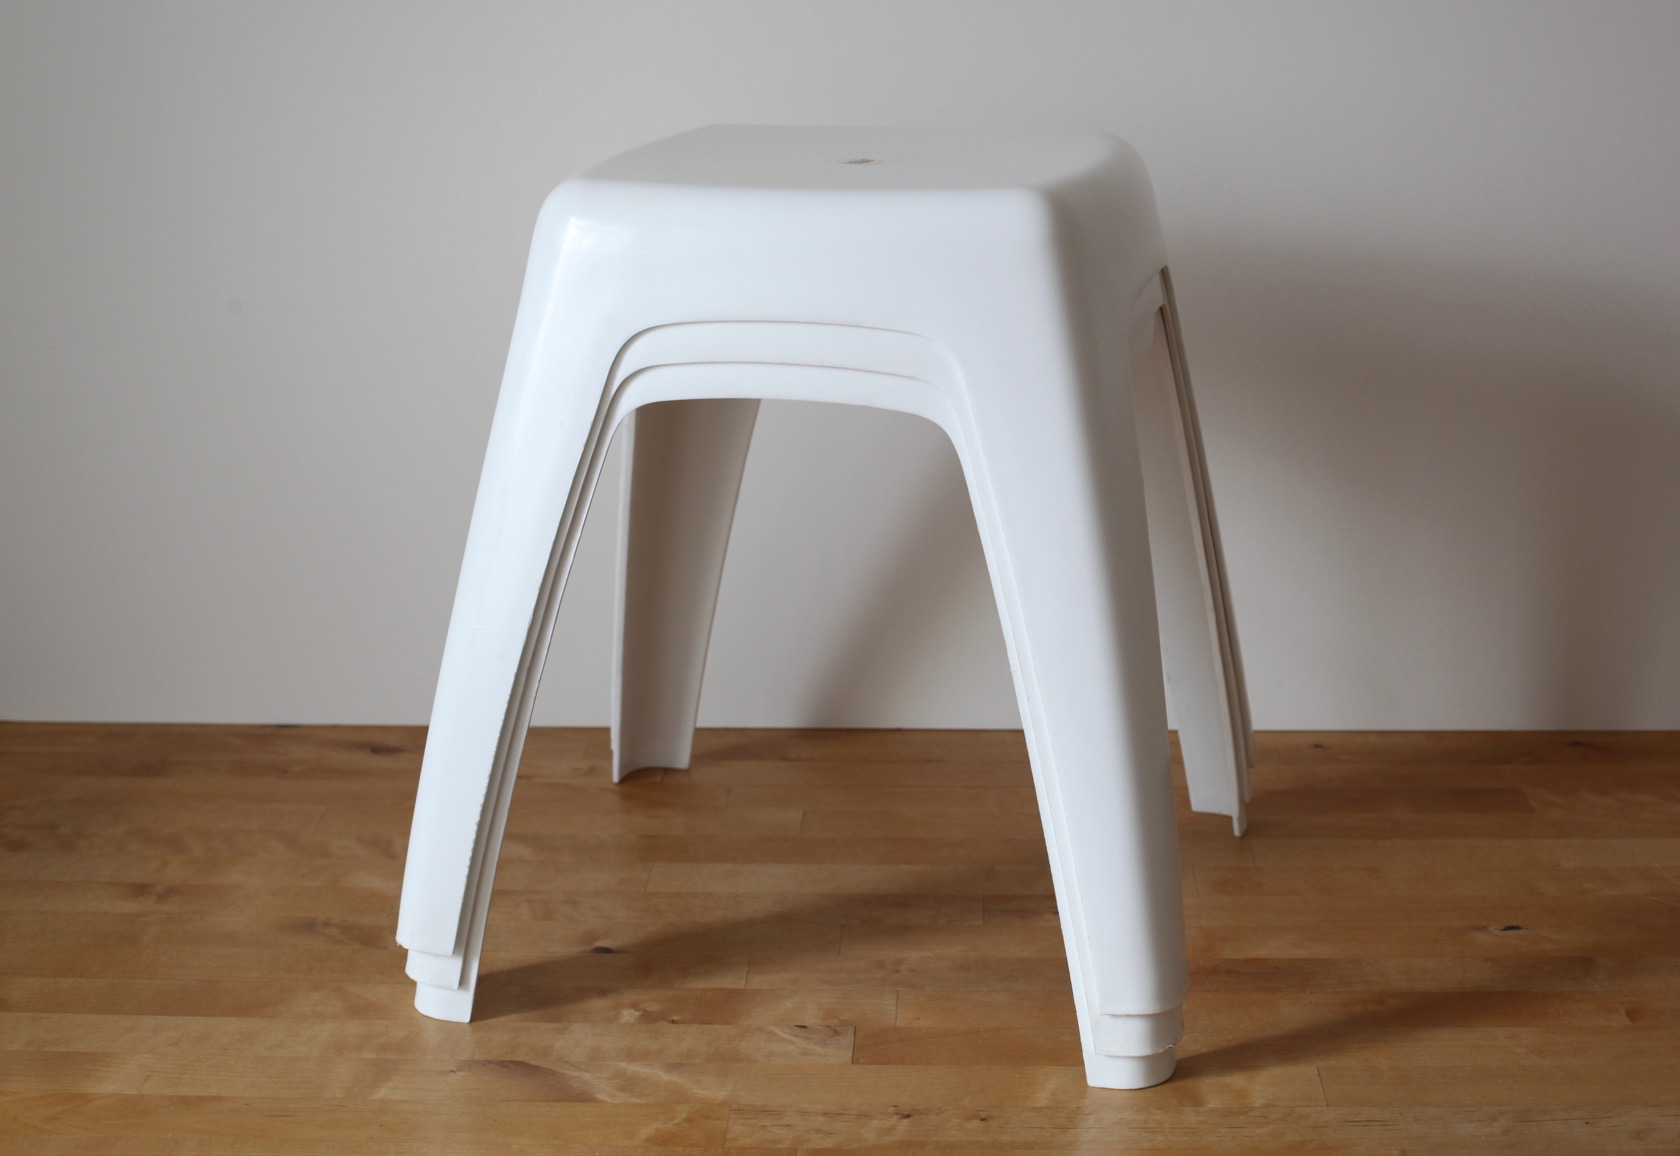 kunststoff stapelhocker aus den 70ern raumwunder vintage wohnen in n rnberg. Black Bedroom Furniture Sets. Home Design Ideas